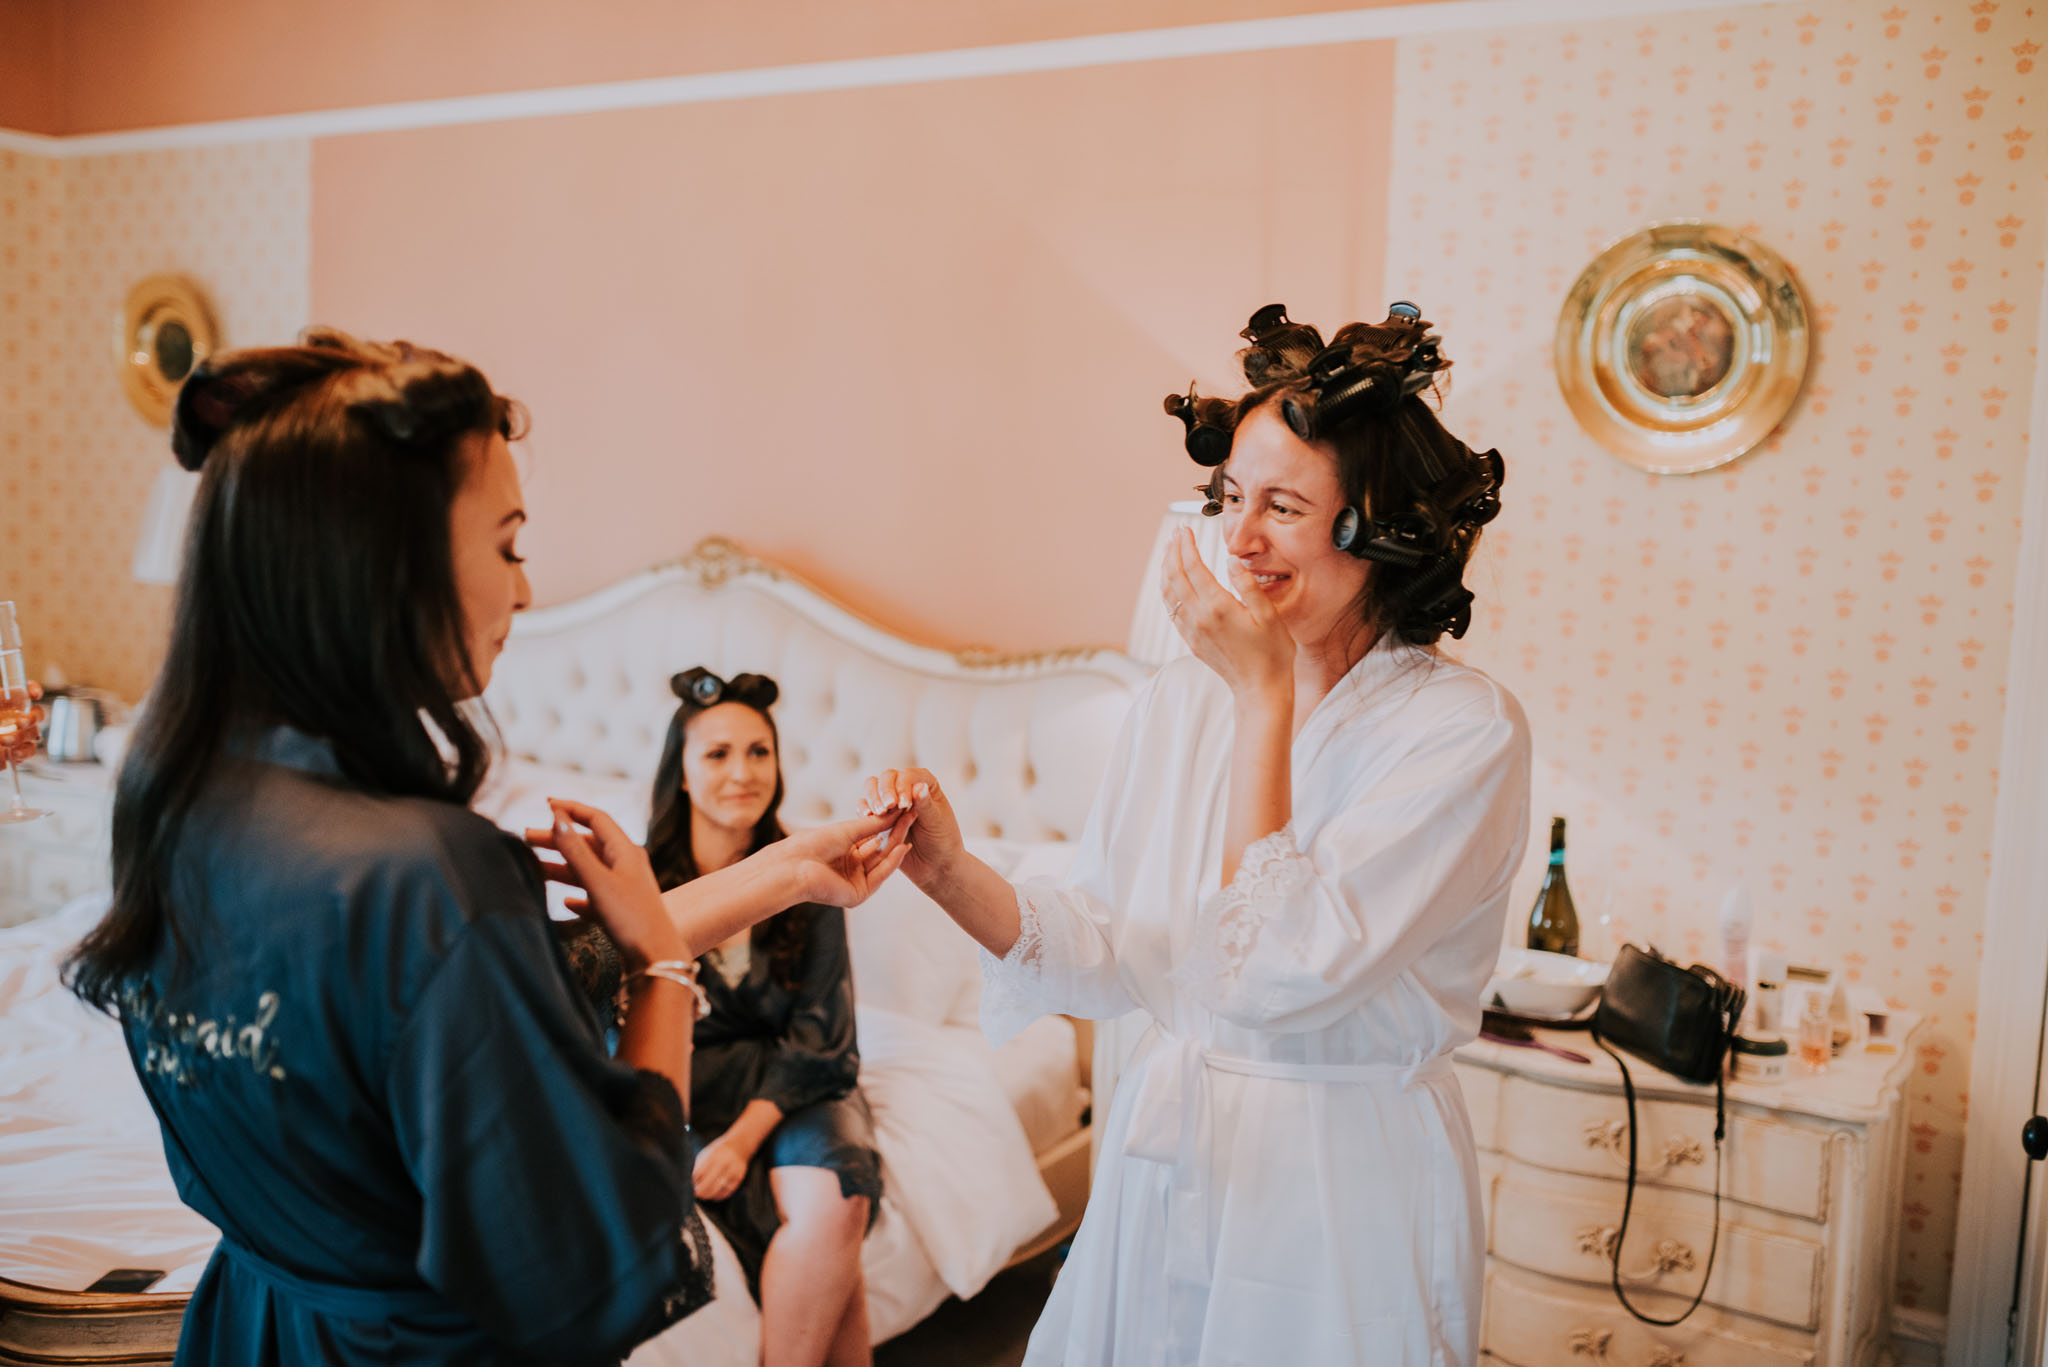 wedding-photographer-glewstone-court-hereford-scott-stockwell-photography047.jpg